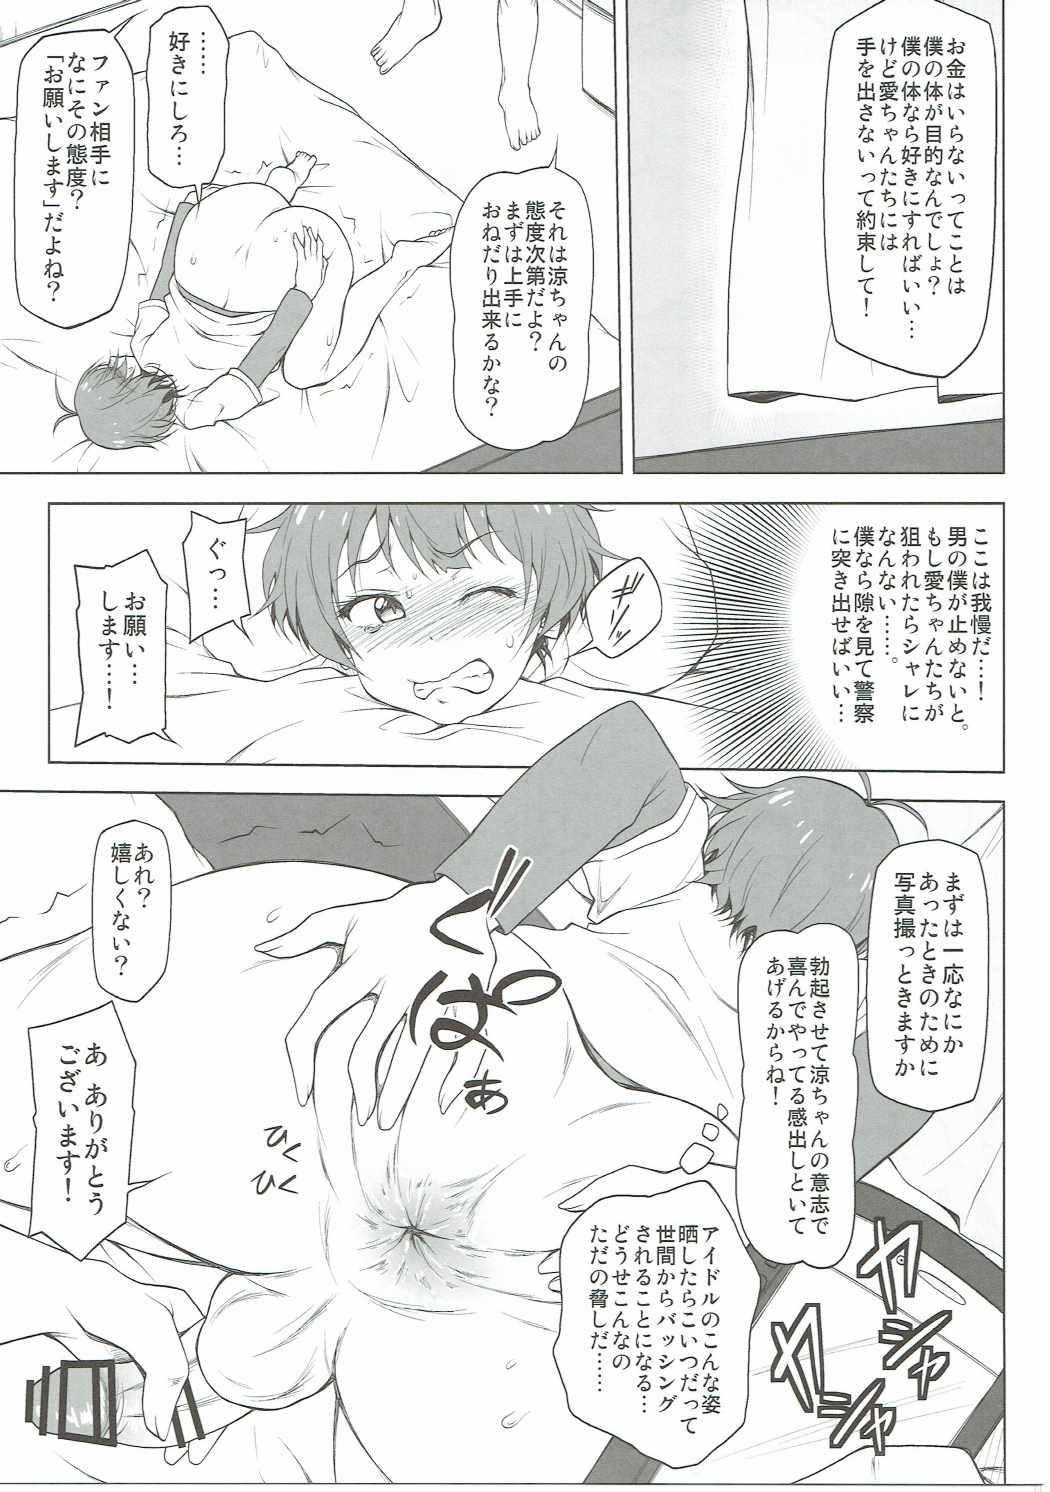 Mesu Ochi 5